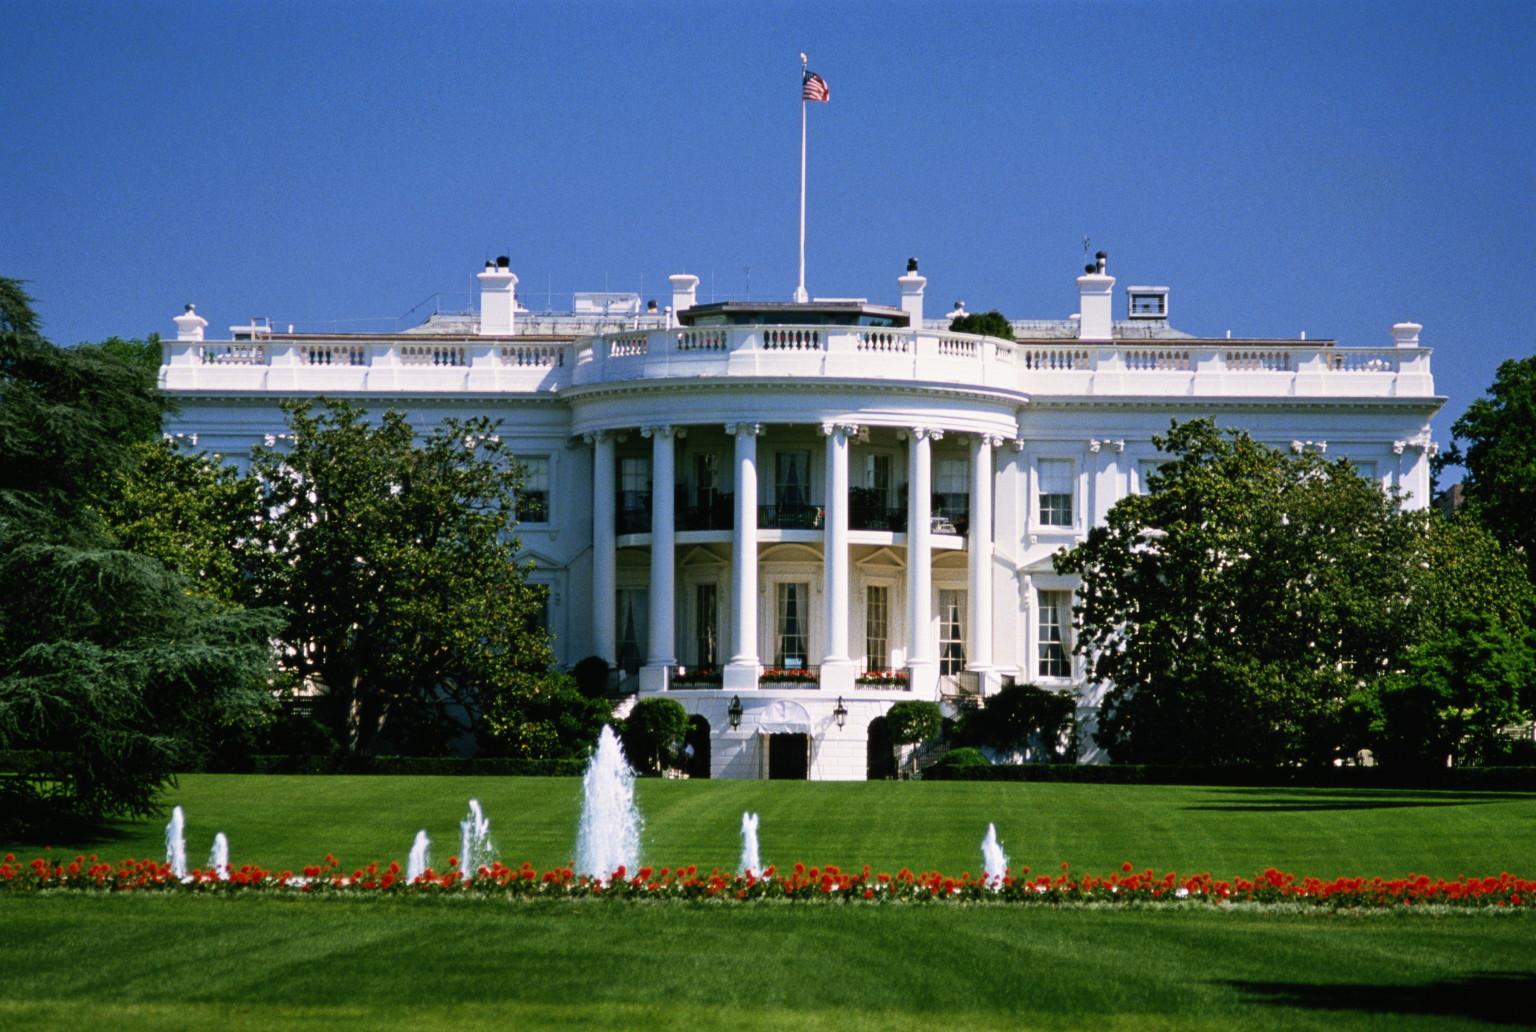 Documentary : Inside 'The White House'